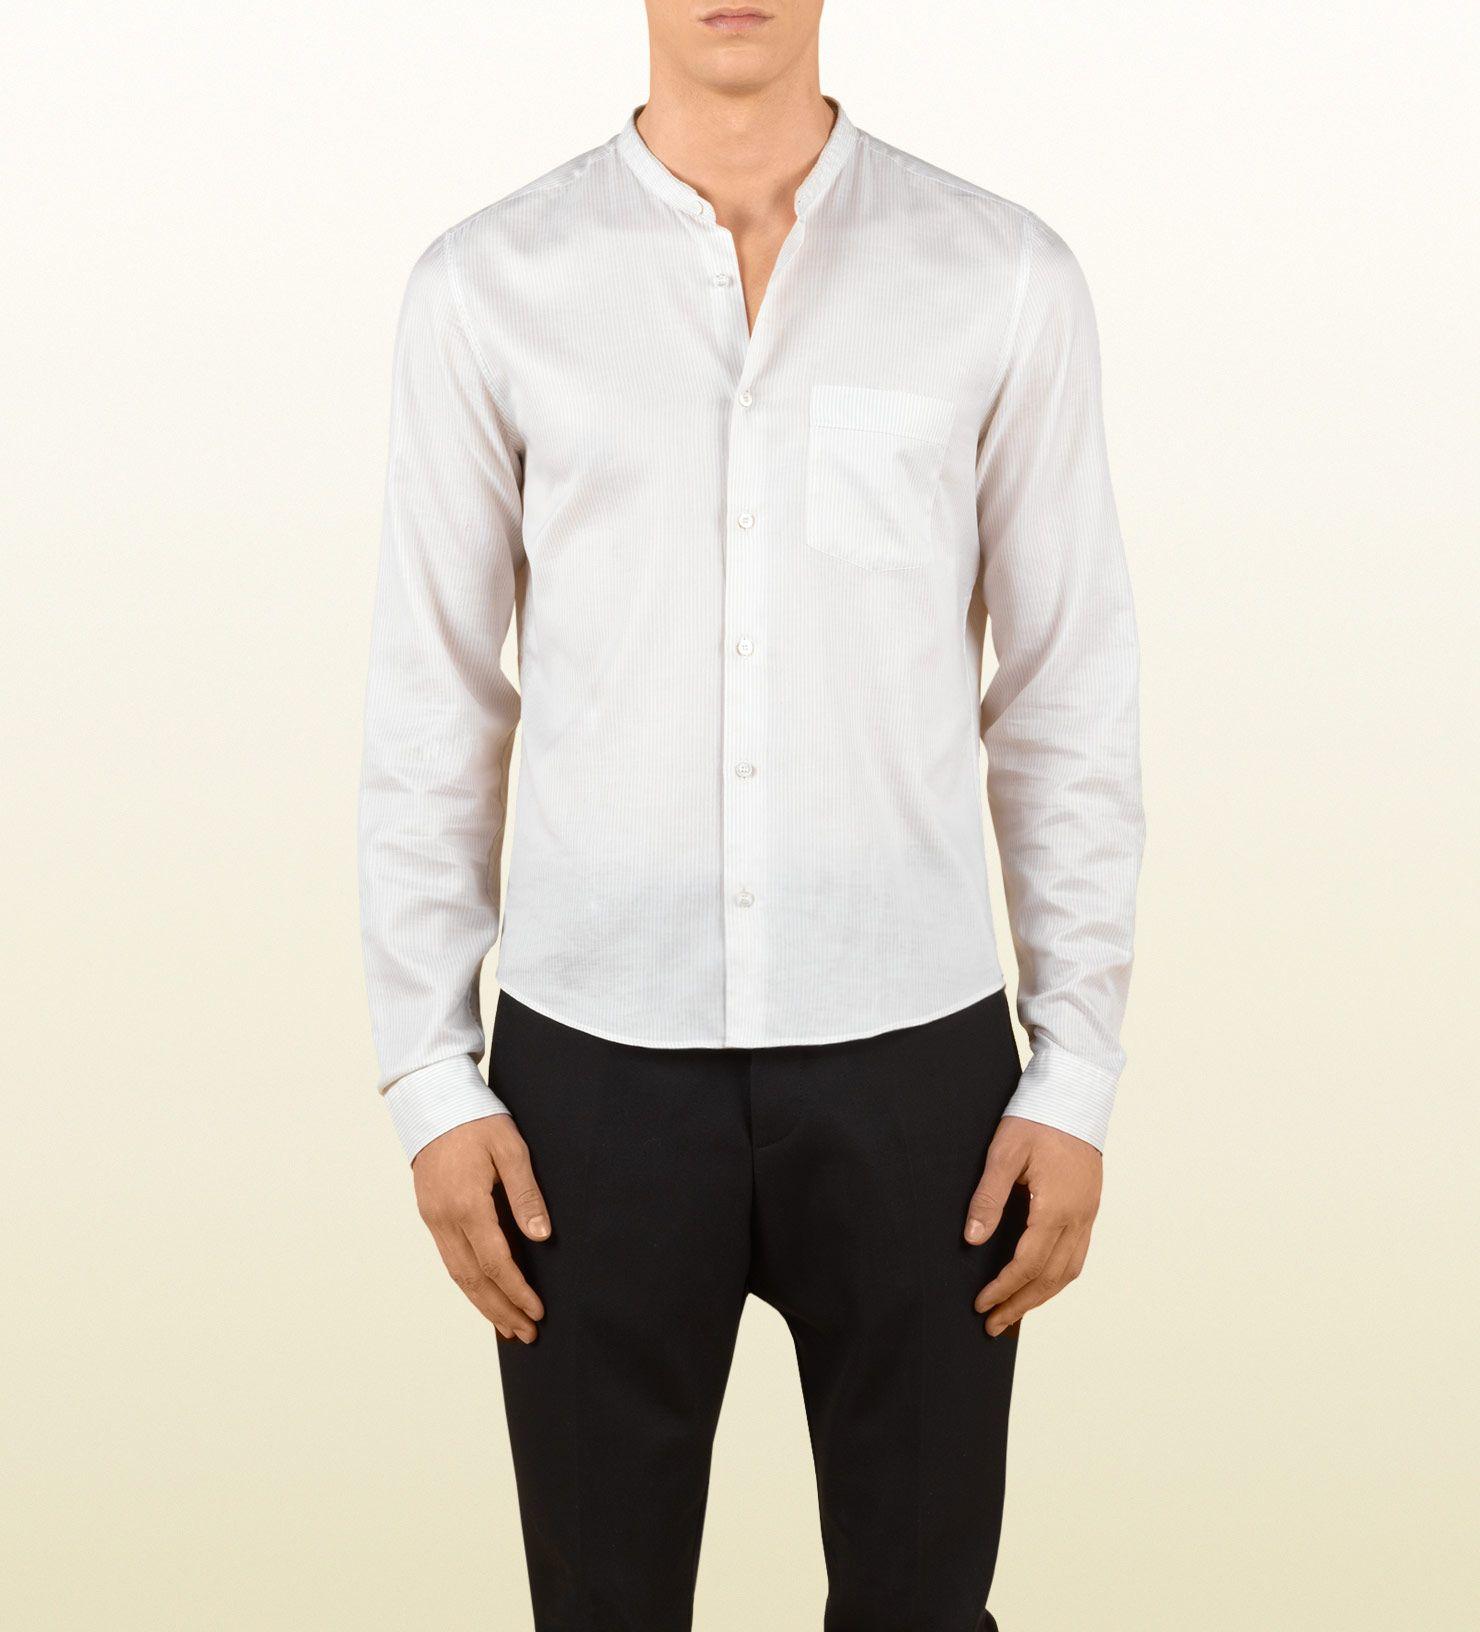 ee839b8eef902 Gucci men light beige twill stripe sport shirt 1